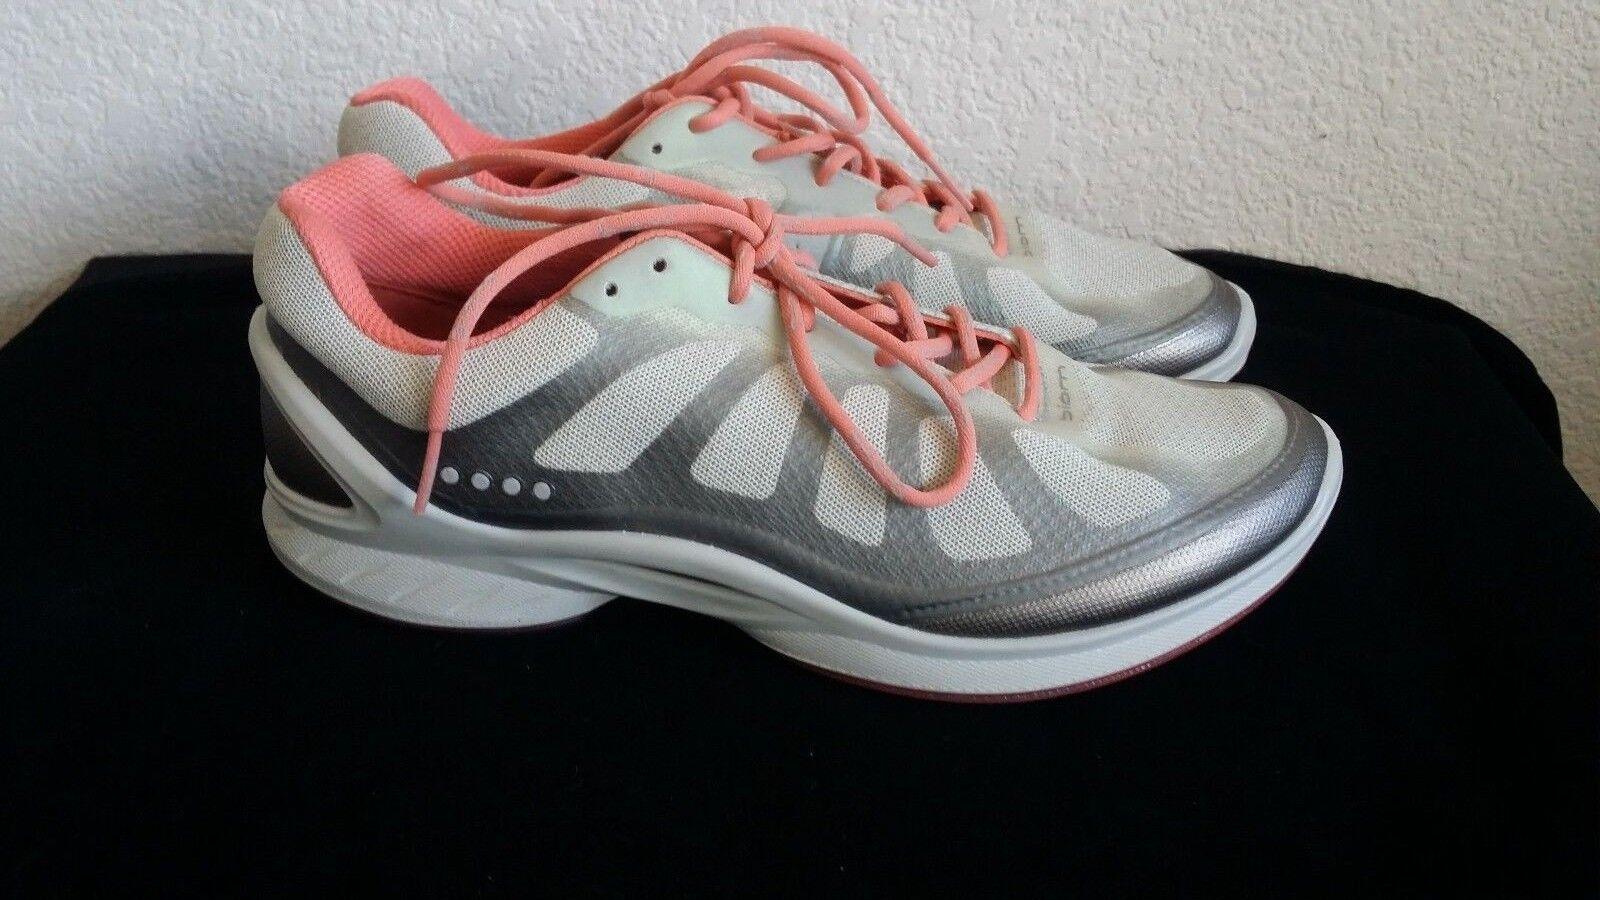 New Ecco biom F Juel blaze sneakers. sneakers. sneakers. sz37. 140. 9561d0